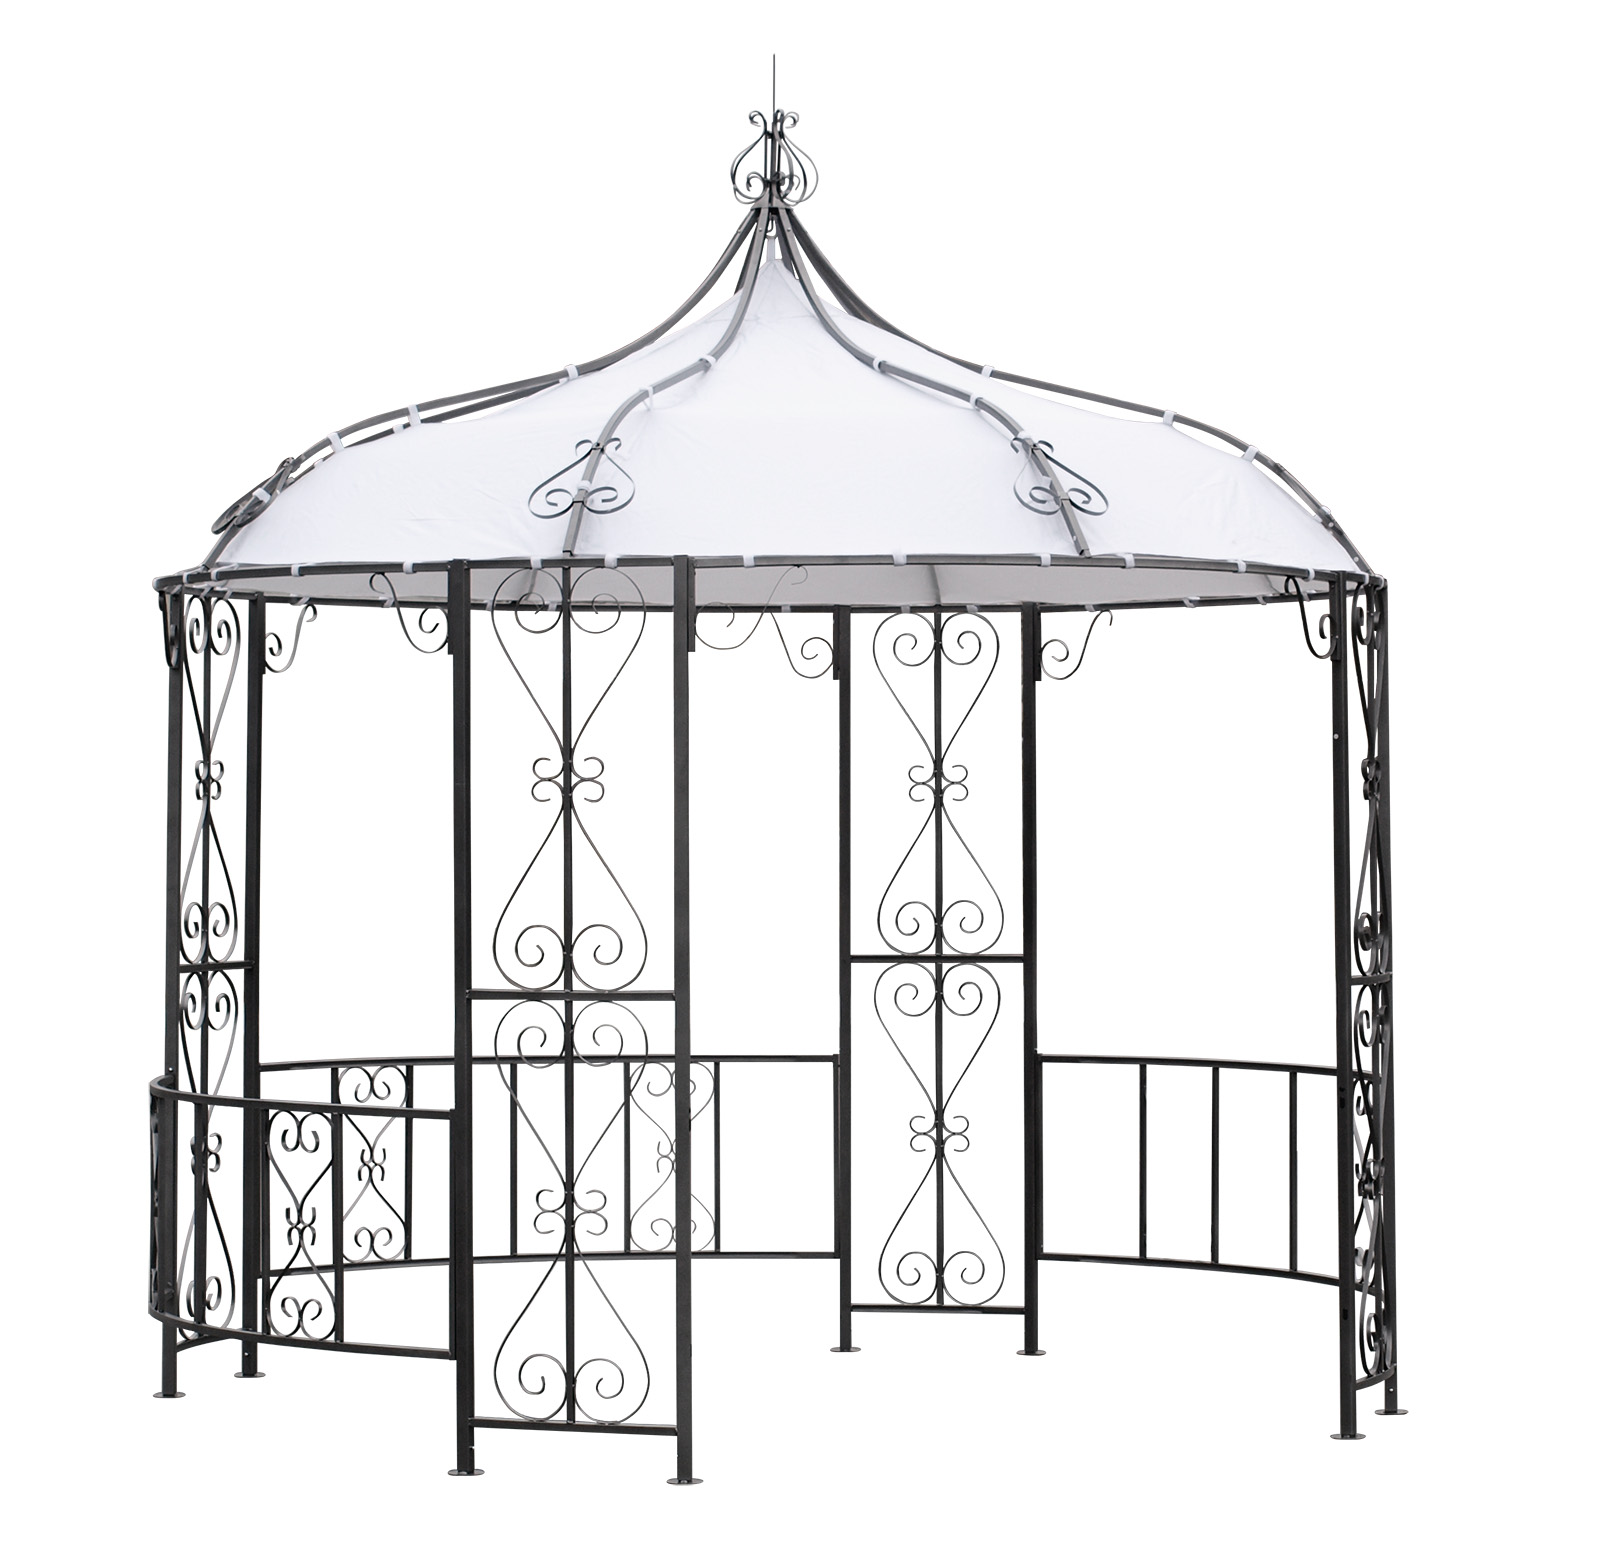 Pavillon BURMA 300cm rund,  Stahl grau, Plane PVC-beschichtet weiss